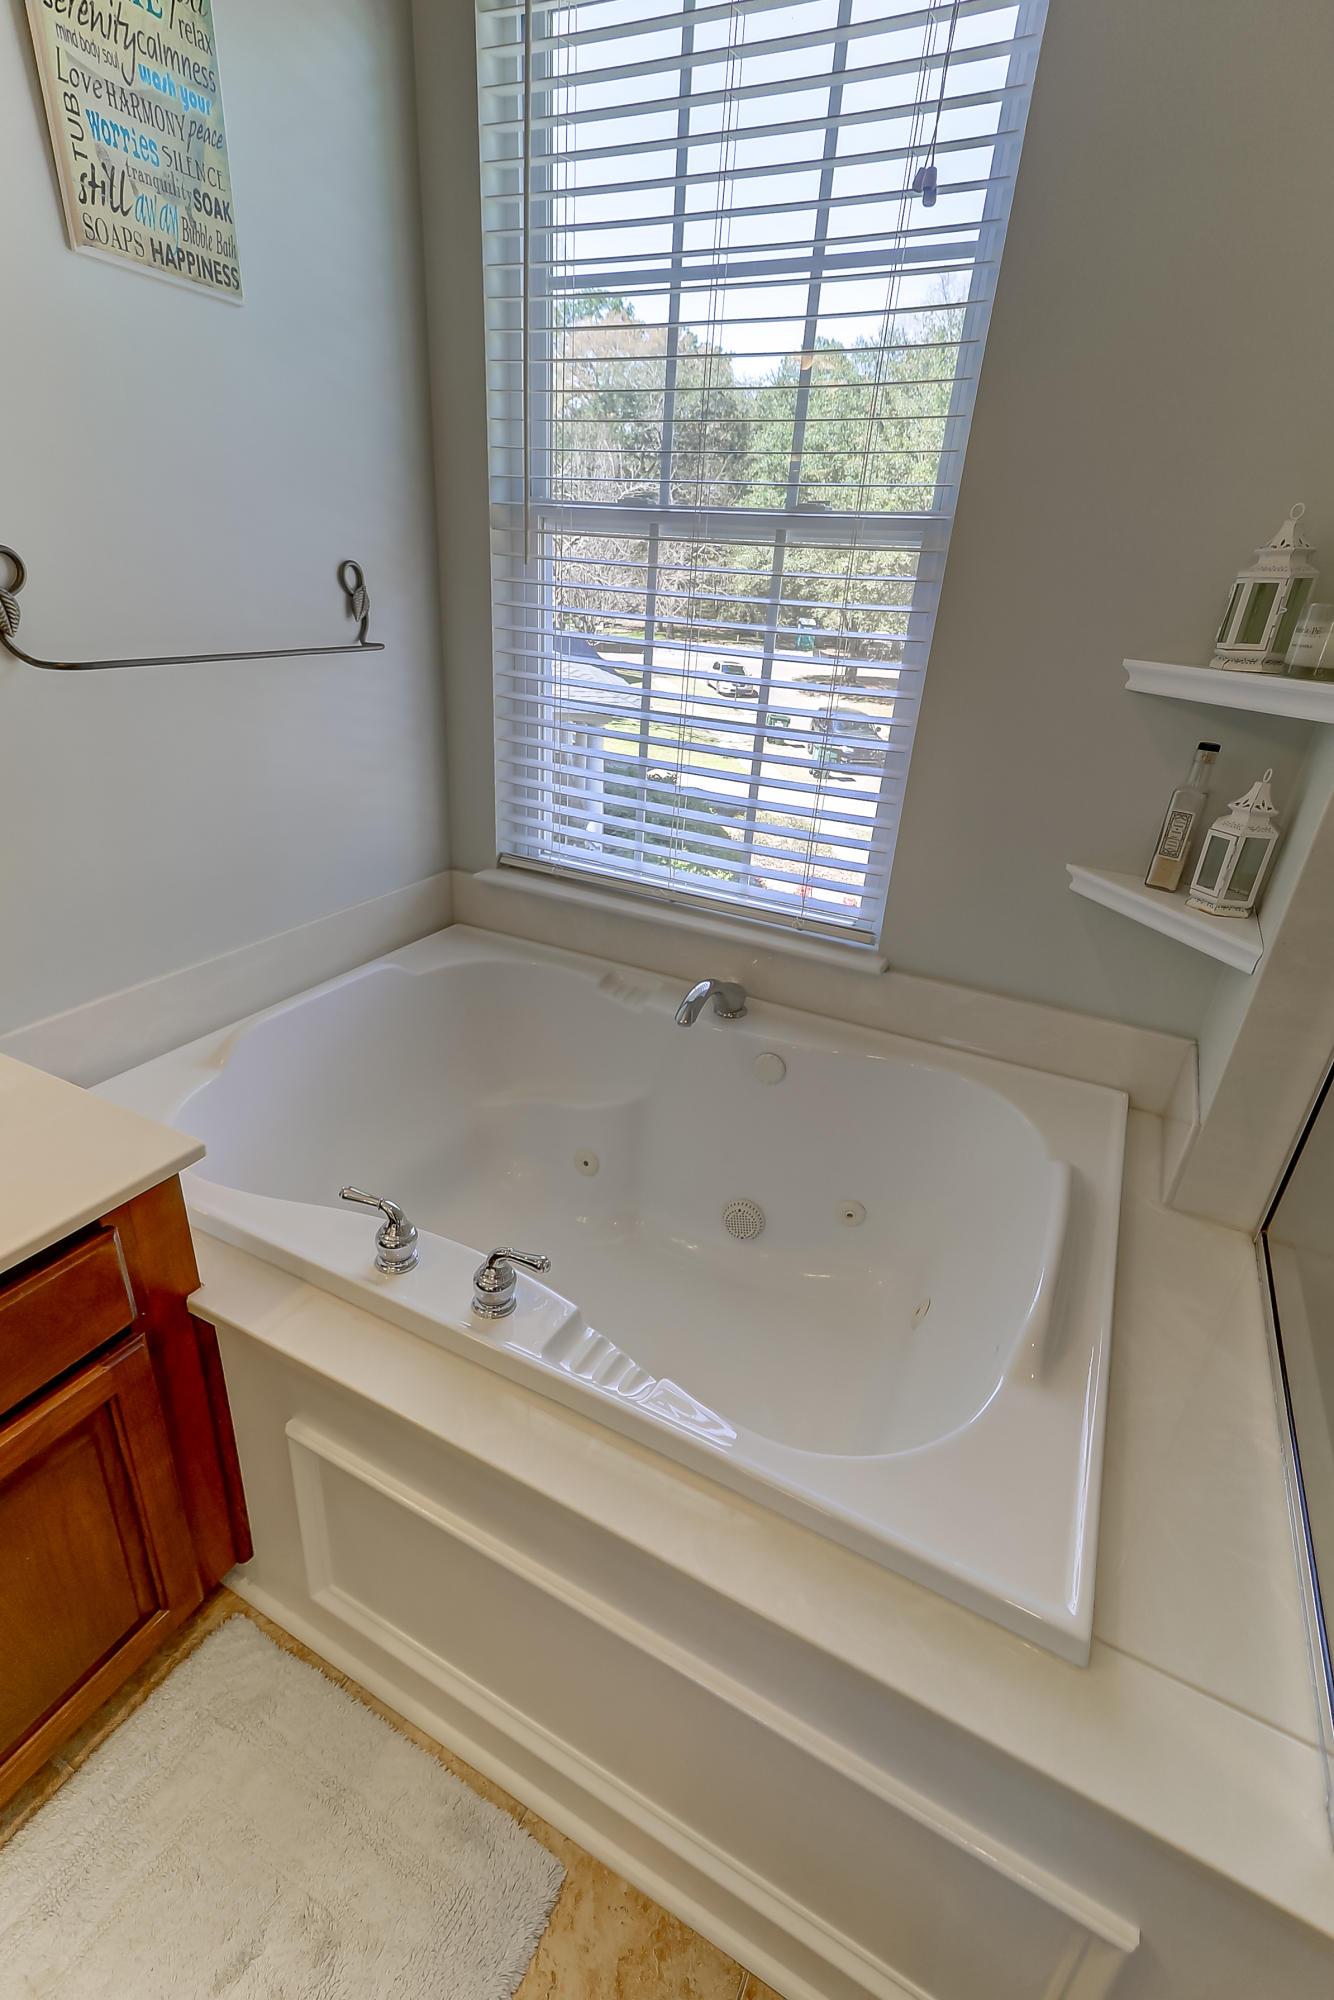 Schieveling Plantation Homes For Sale - 1003 Blockade Runner, Charleston, SC - 10